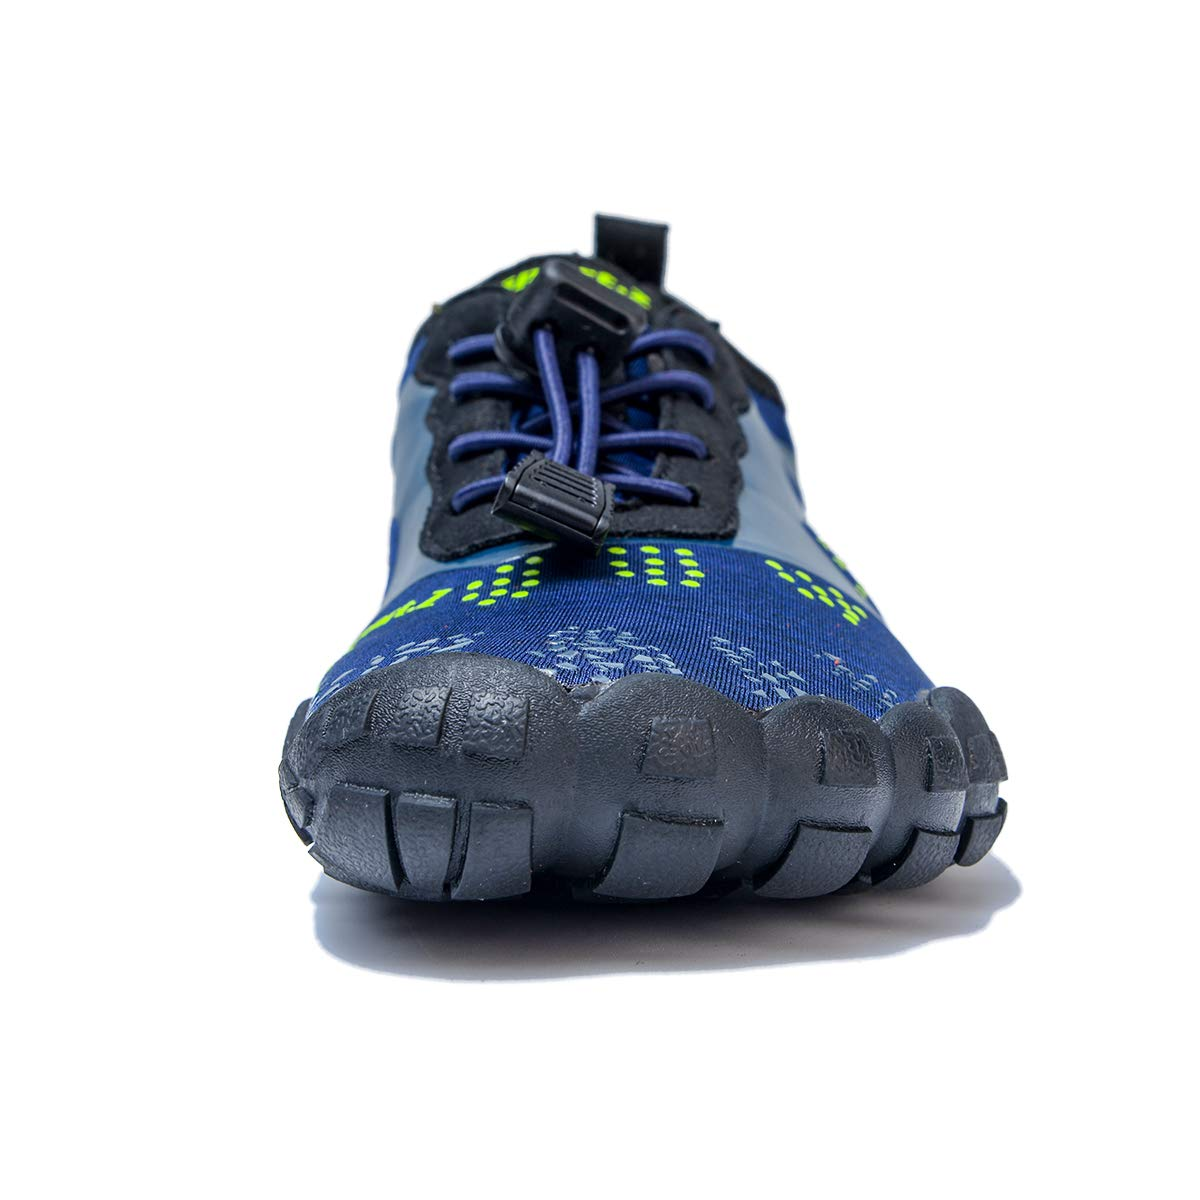 Ginjang Men Women Water Shoes Barefoot Quick Dry for Yoga Swim Diving Surf Aqua Sports Beach Walking